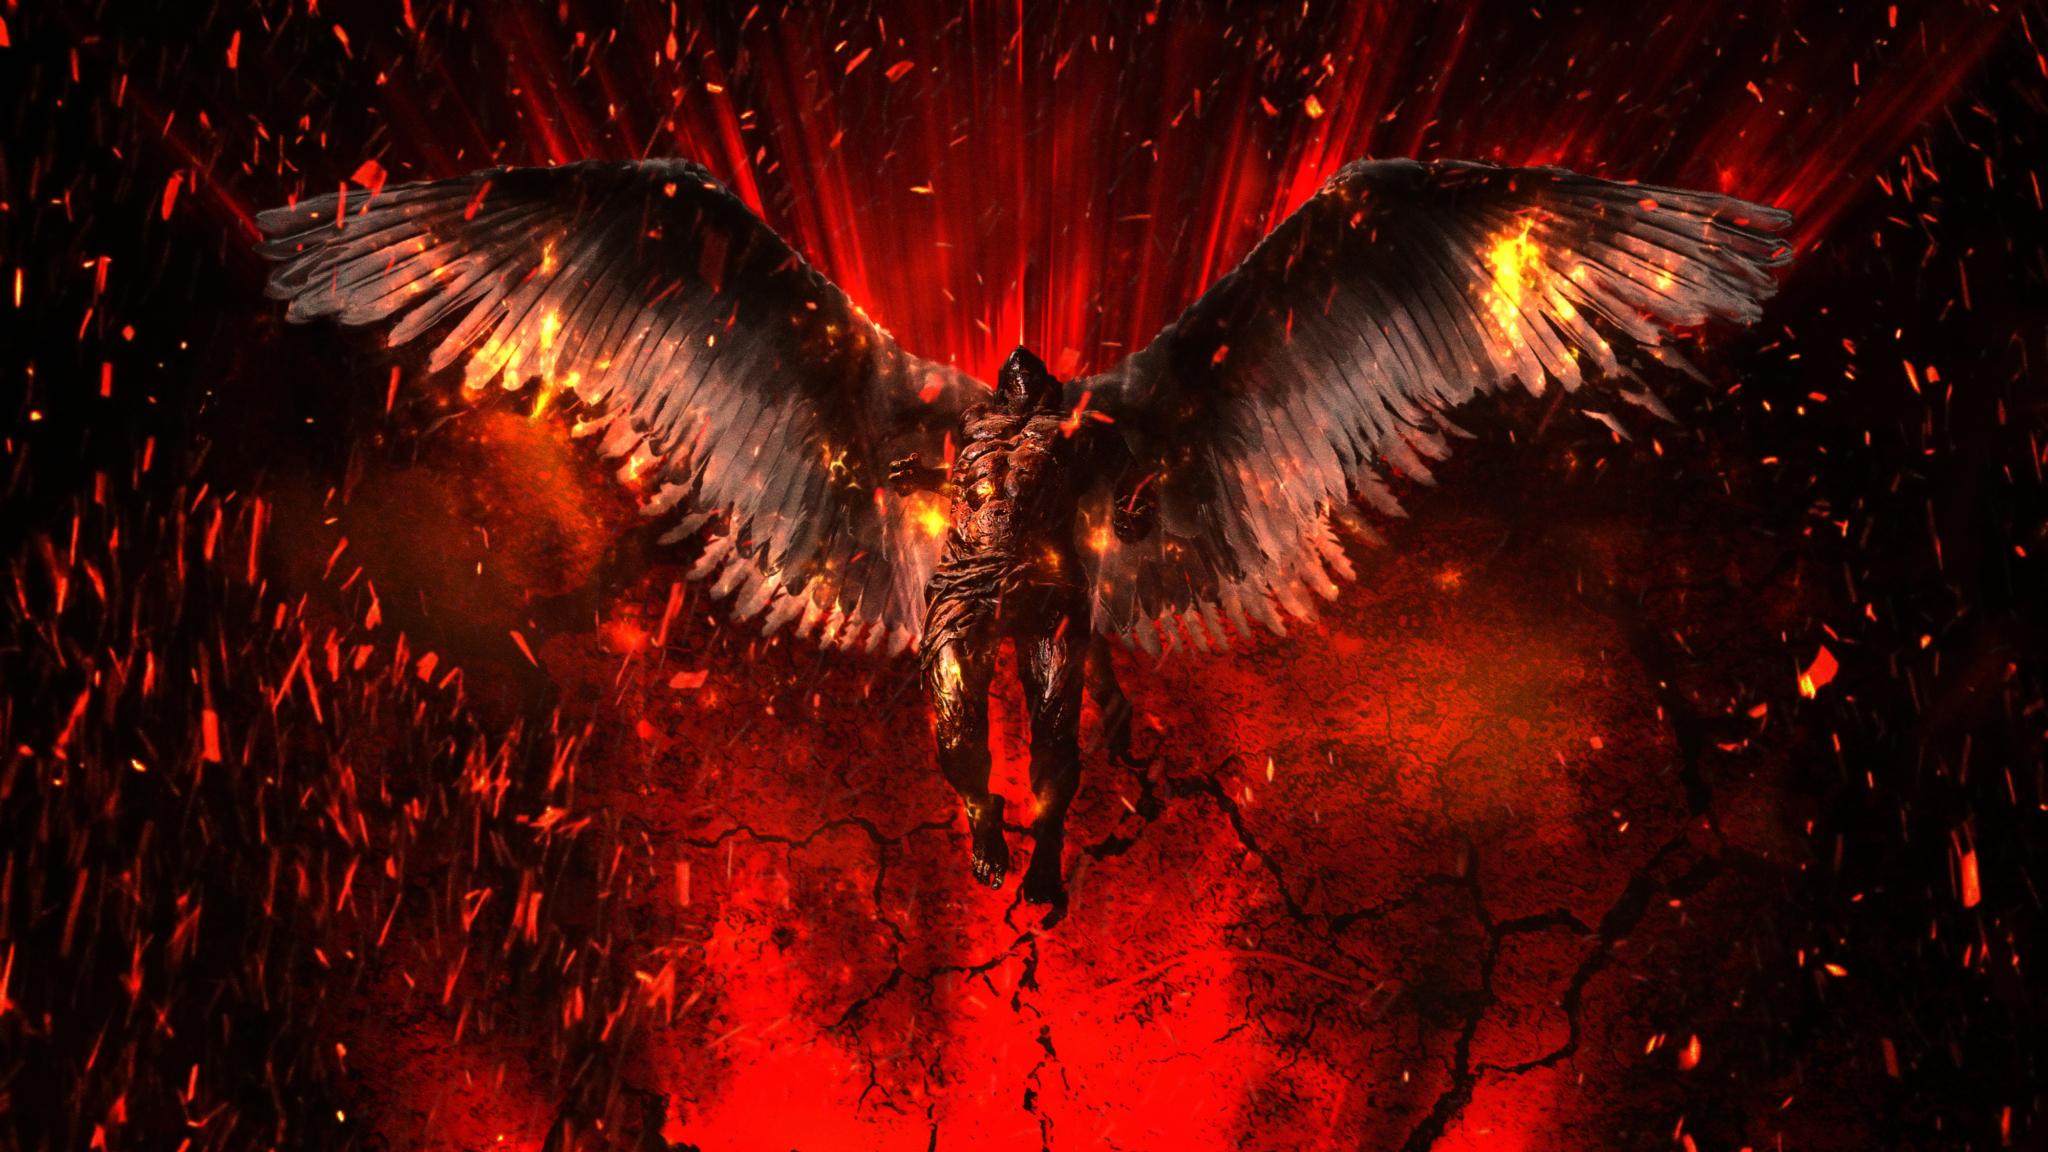 2048x1152 Lucifer 4K Artwork 2048x1152 Resolution ...